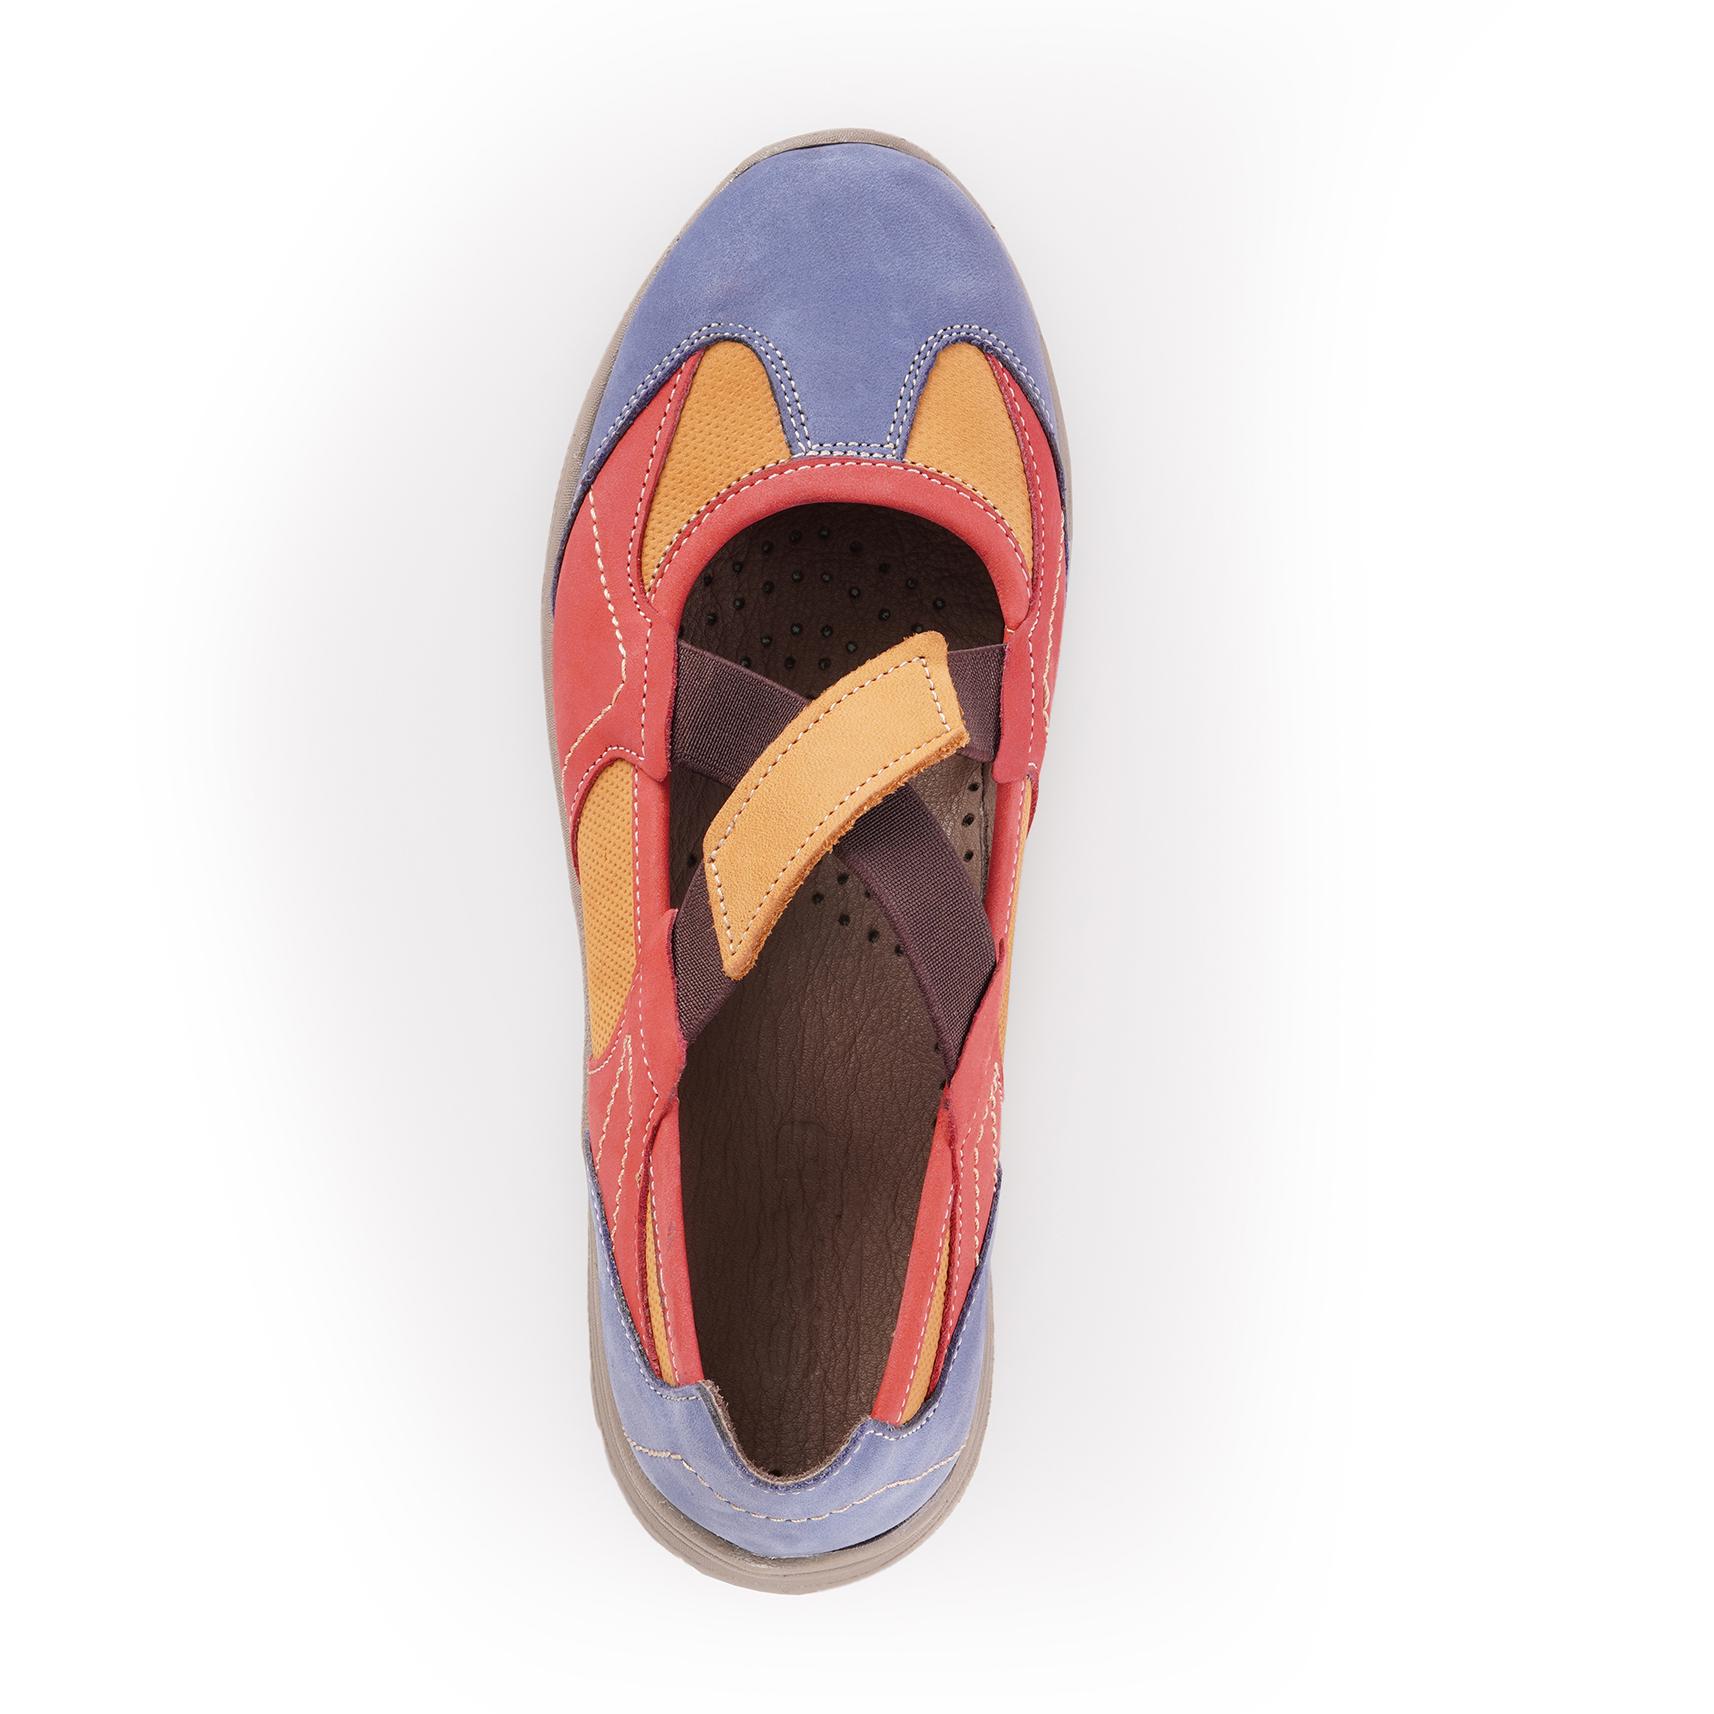 کفش روزمره زنانه صاد کد PP2401